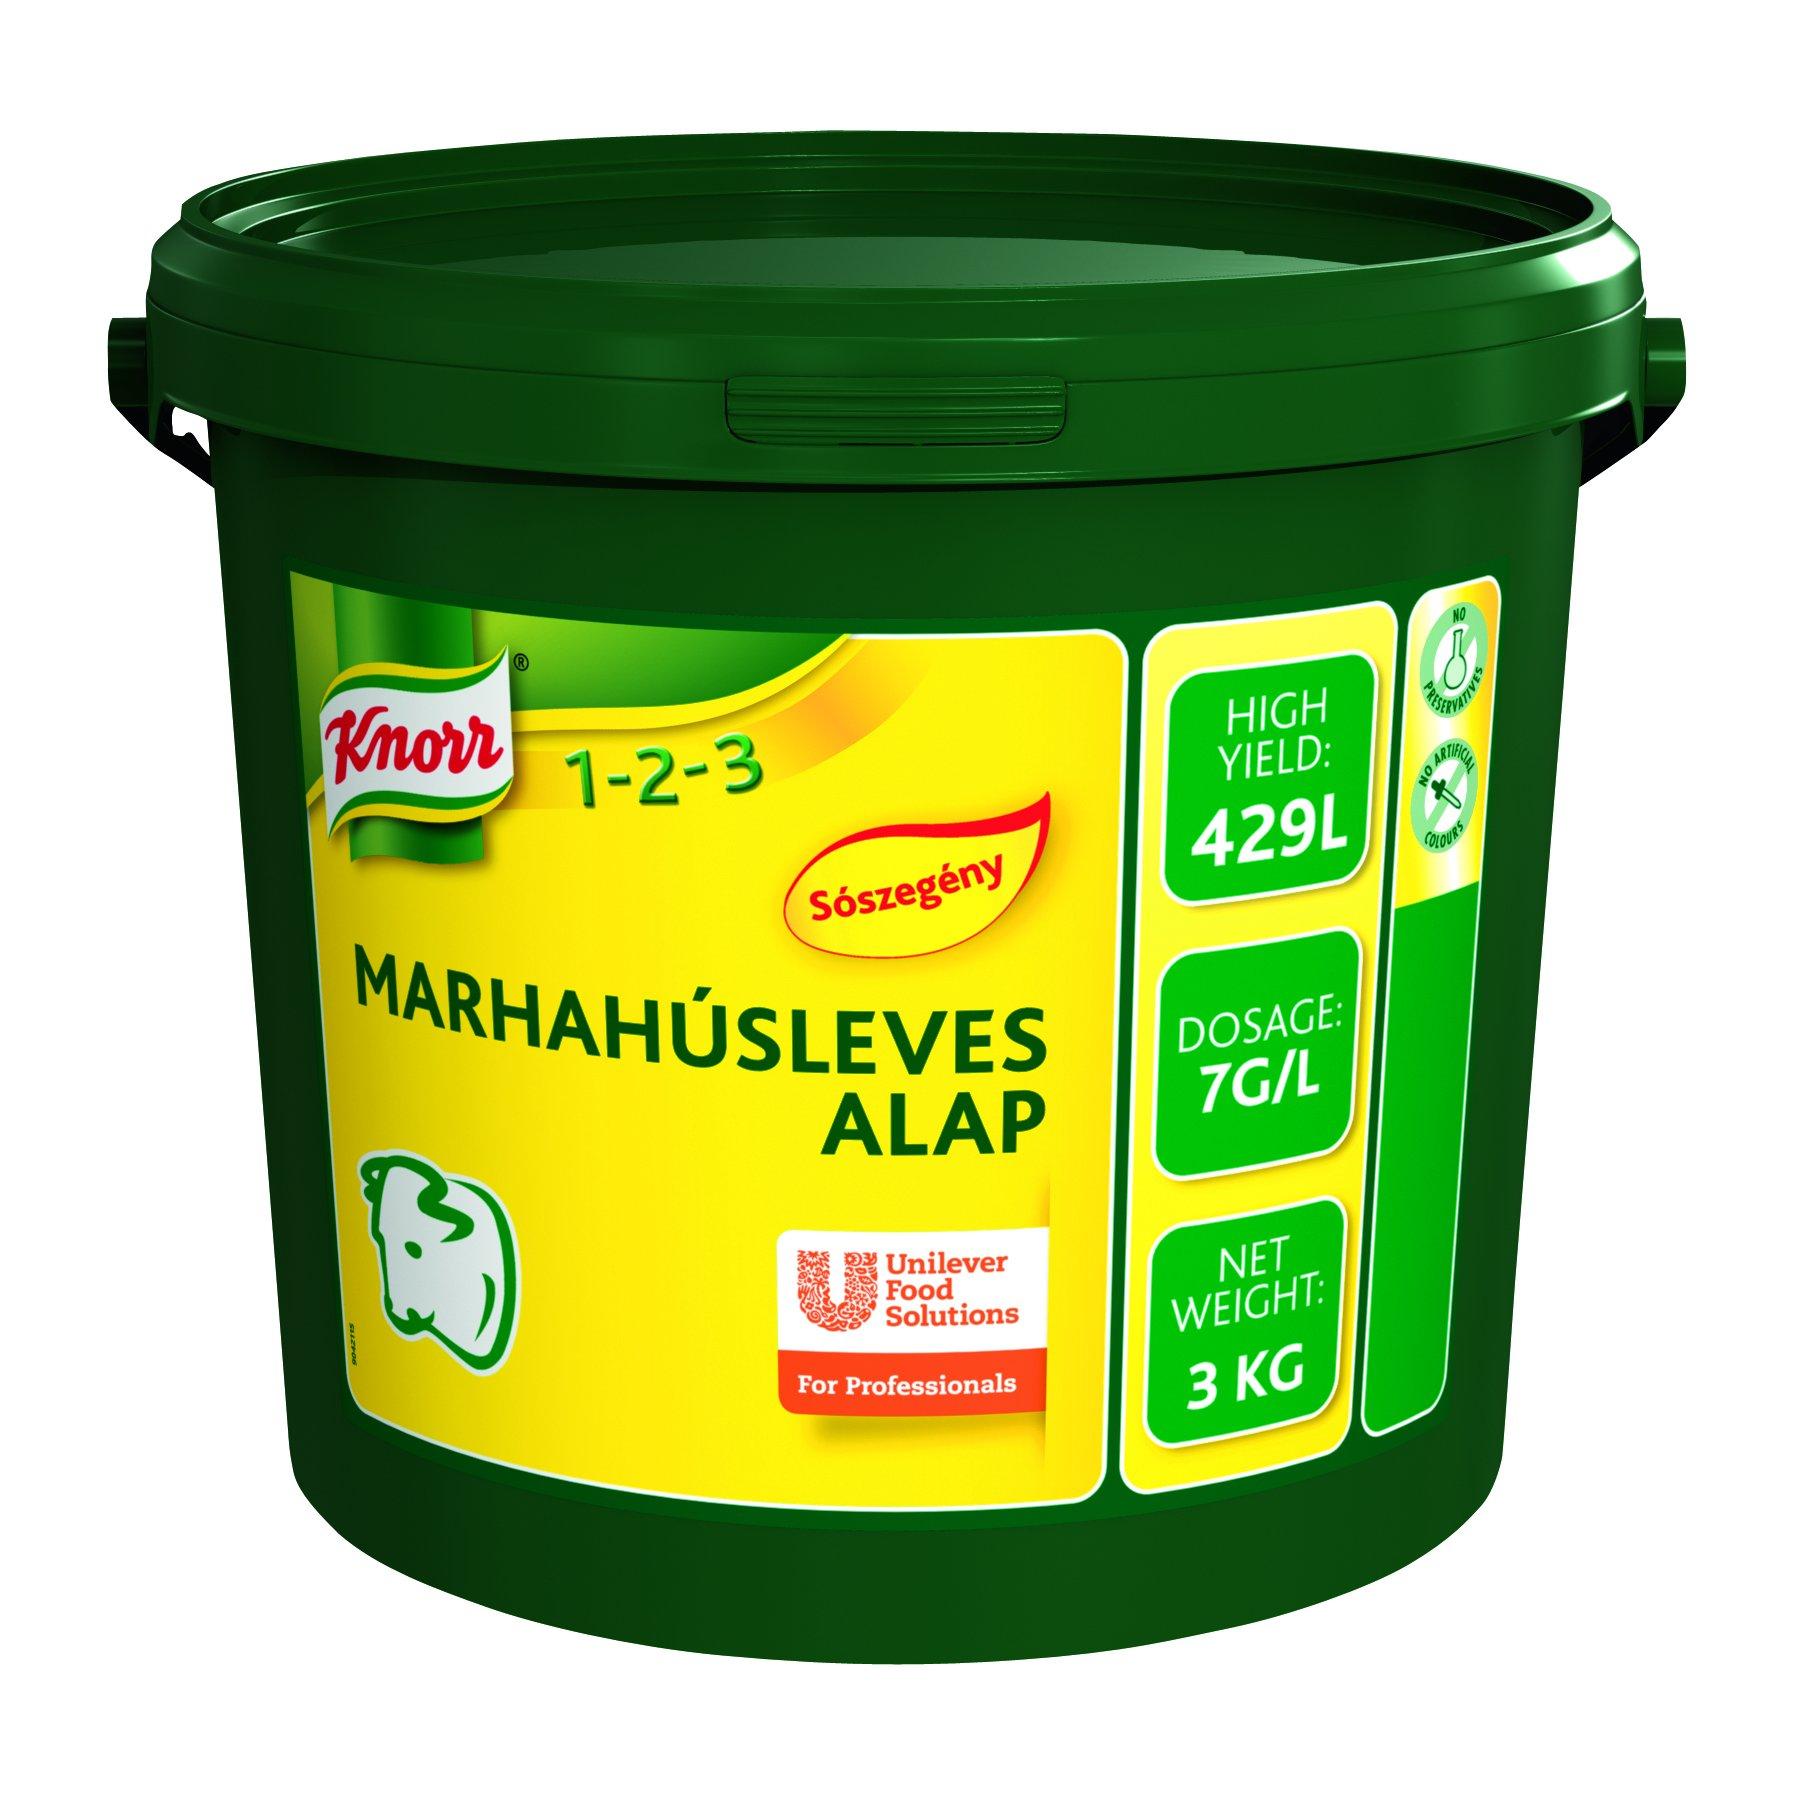 KNORR Marhahúsleves alap - Sószegény 3kg -